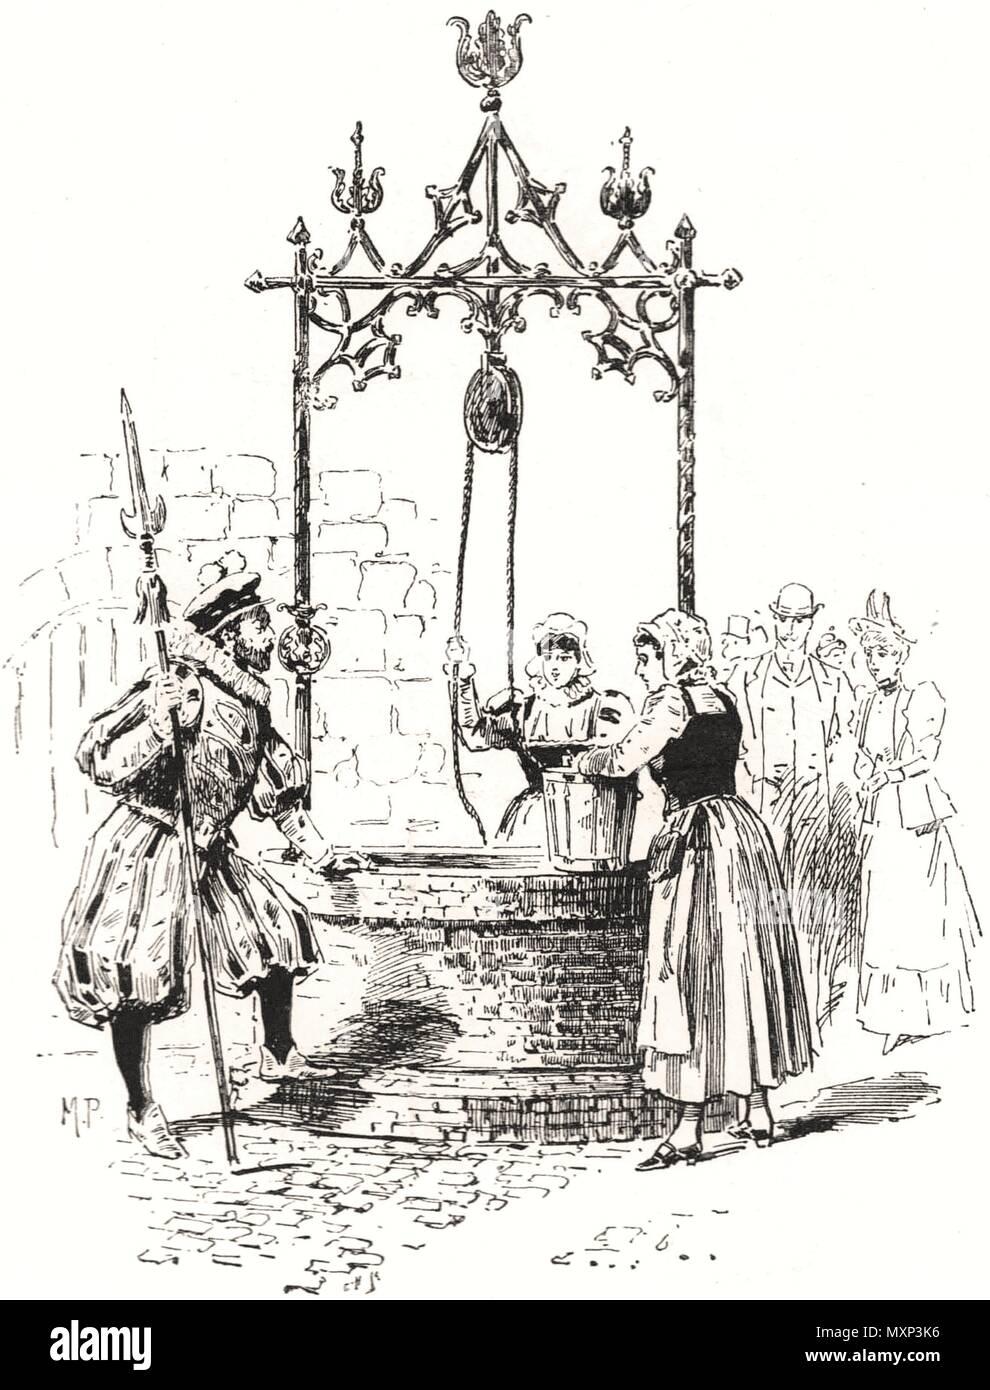 A sixteenth century flirtation. Romance 1894. The Illustrated London News - Stock Image